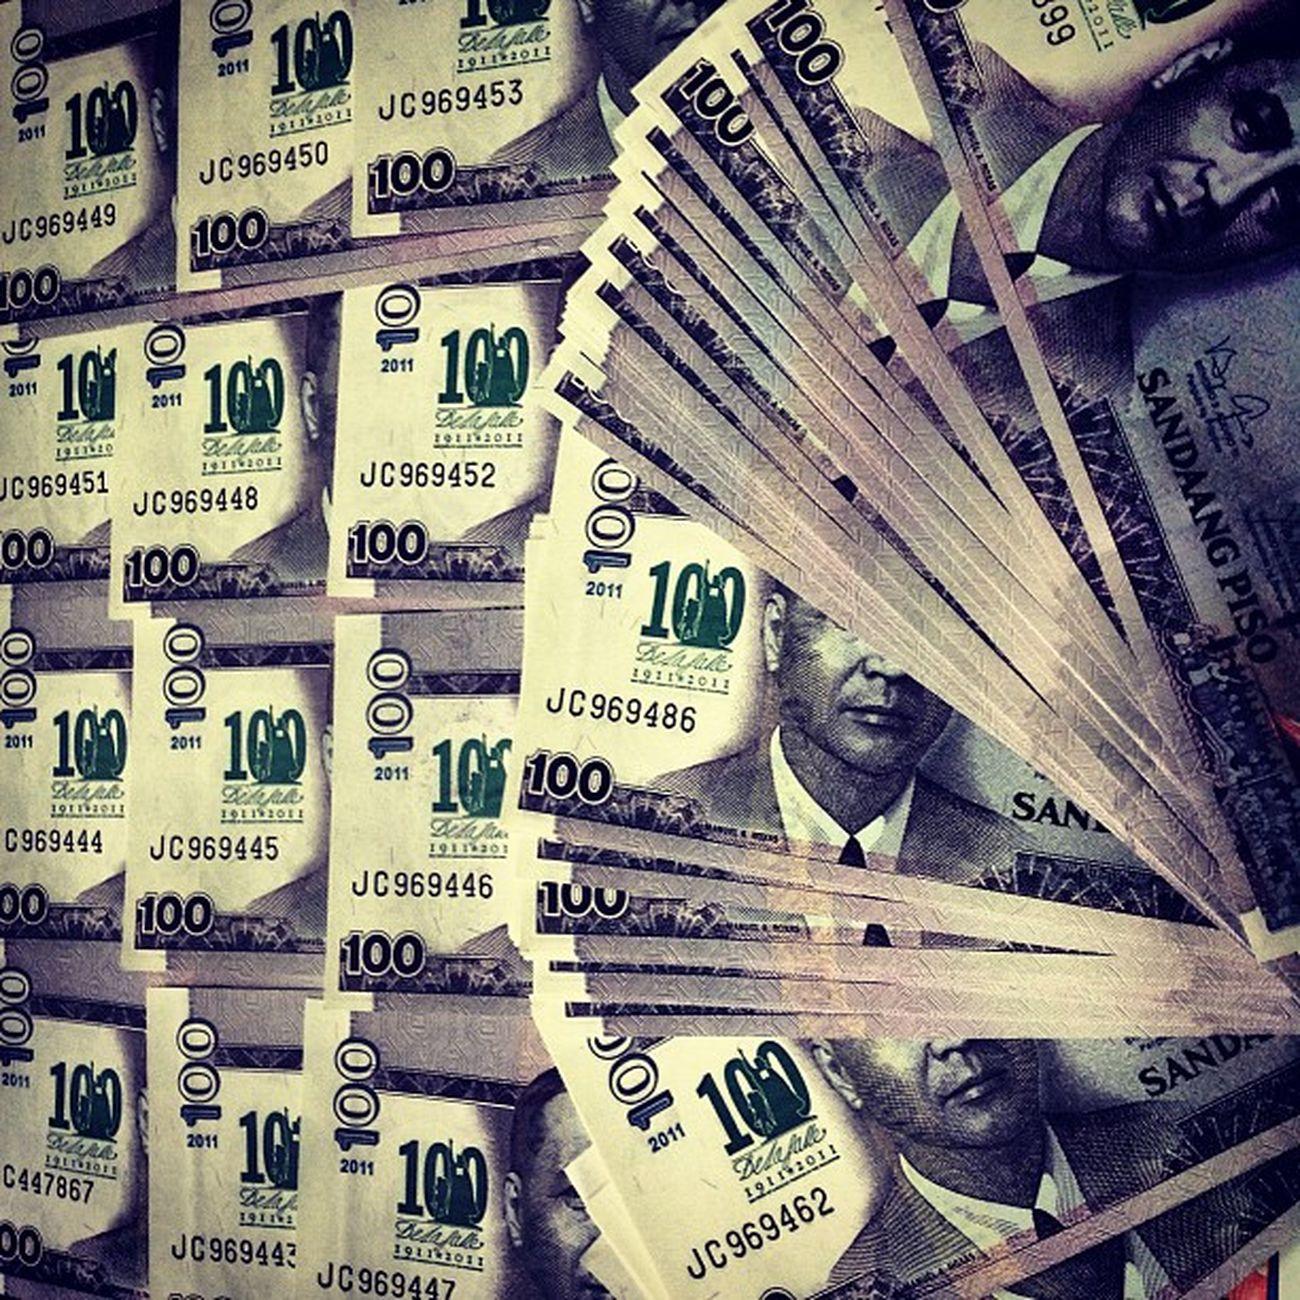 100 pcs of 100LaSalle commemorative 100-peso bill DLSU Delasalle Delasalleuniversity Lasalle centennial commemorative 100pesobill 100lasalle instapic instagram instagraphy themanansala photography